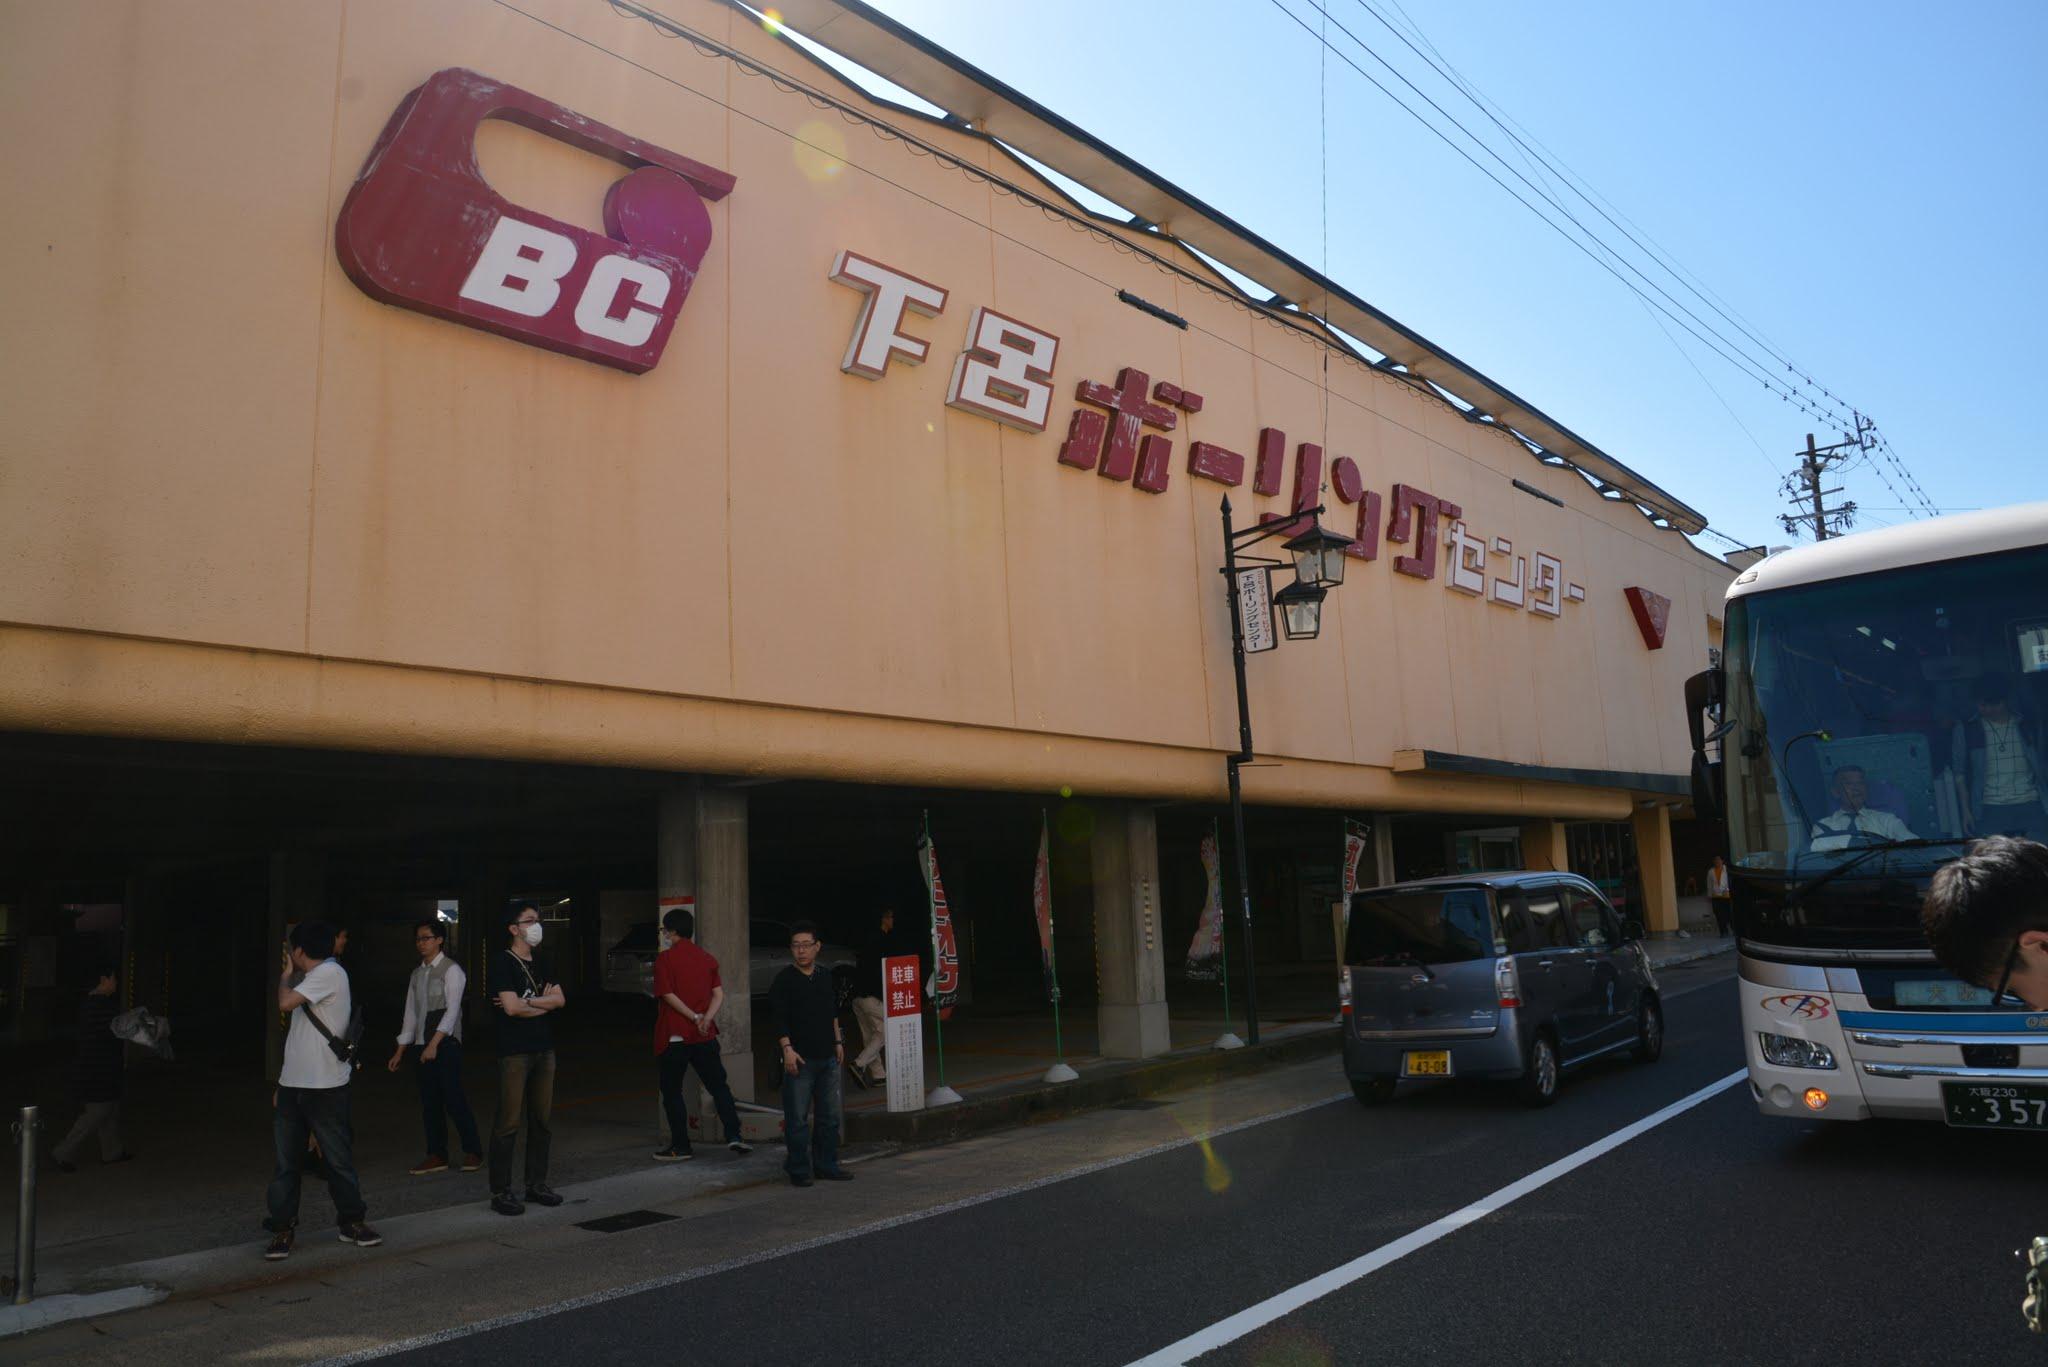 2016大阪オフィス社員旅行 in 岐阜_e0206865_23341062.jpg